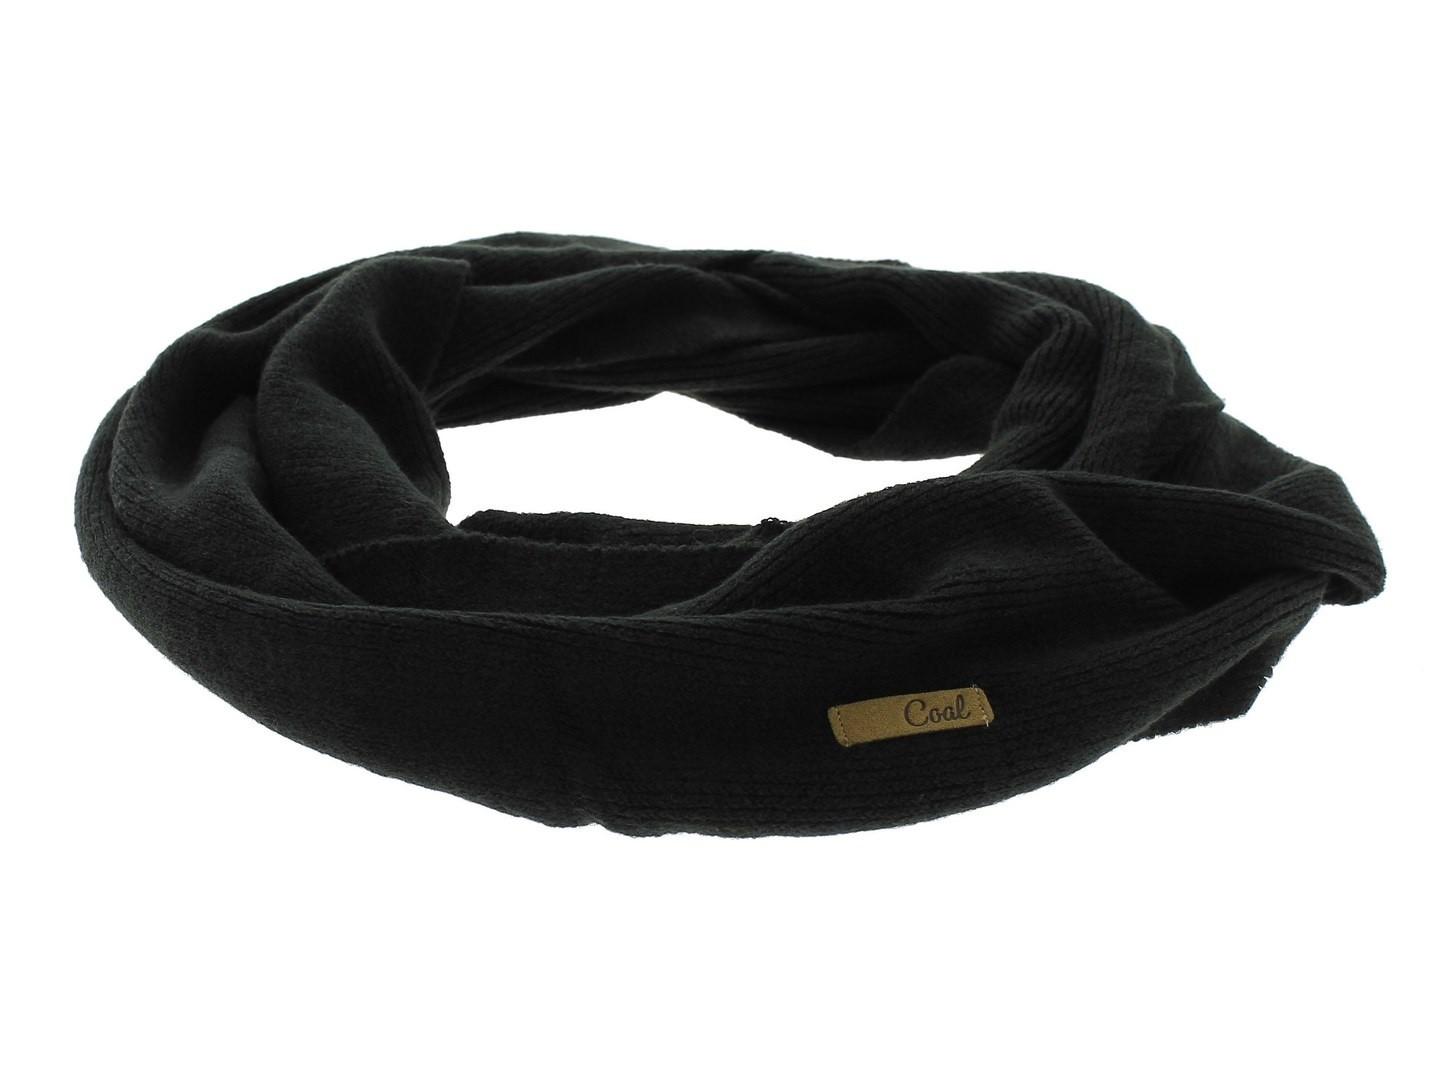 991161e3a598 https://www.chapellerie-traclet.com/en/men-s-beanies/6217-bonnet ...